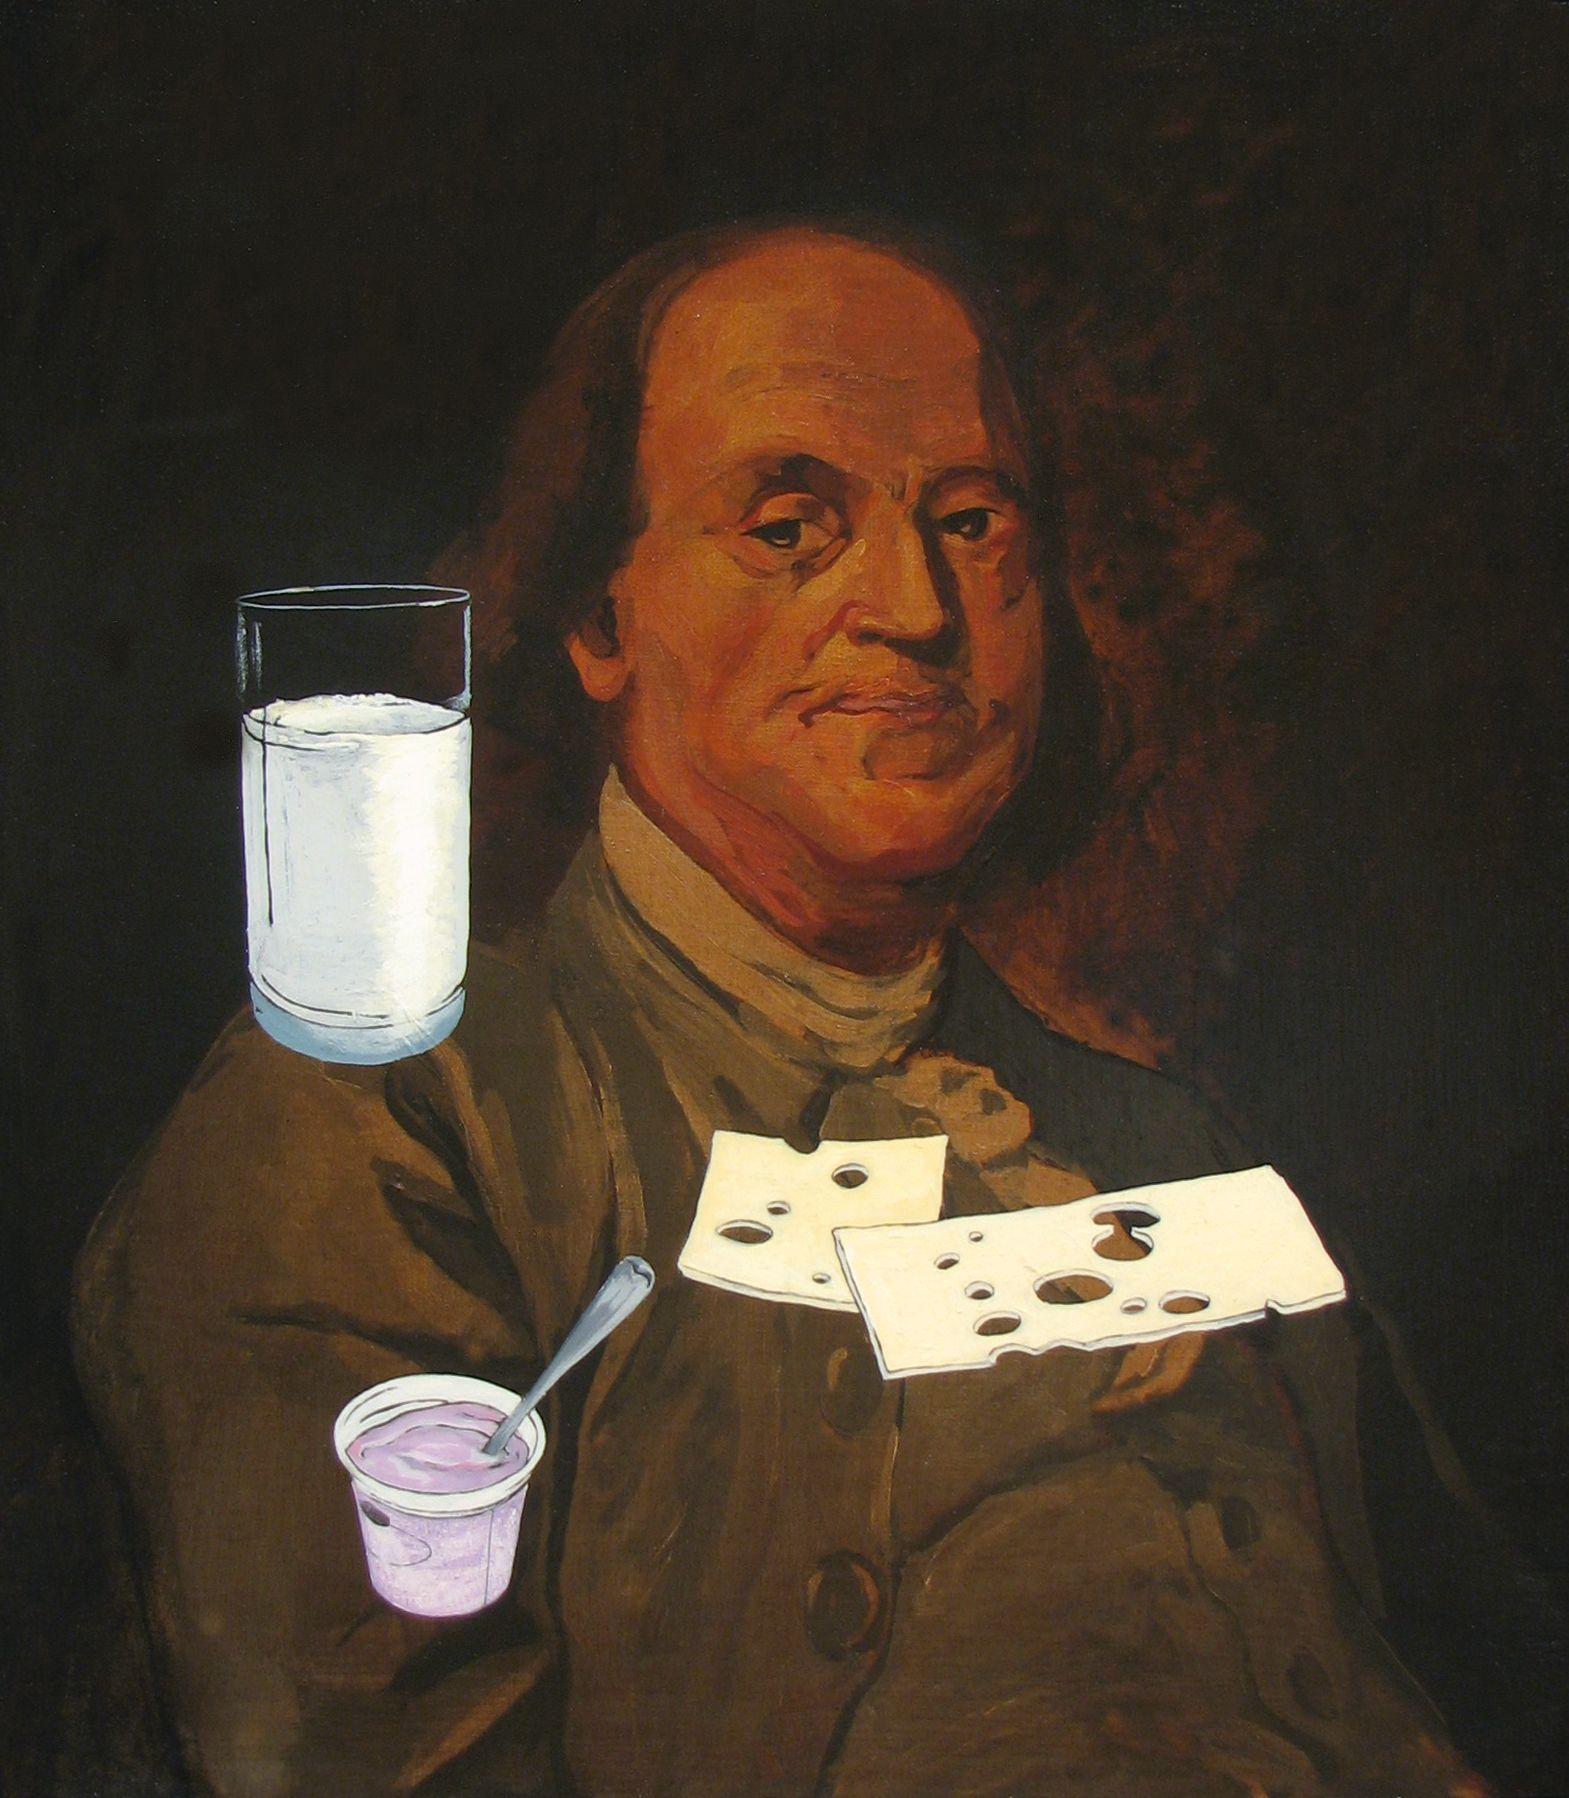 ADAM MYSOCK Franklin's Milk, Yogurt, and Cheese, 2009